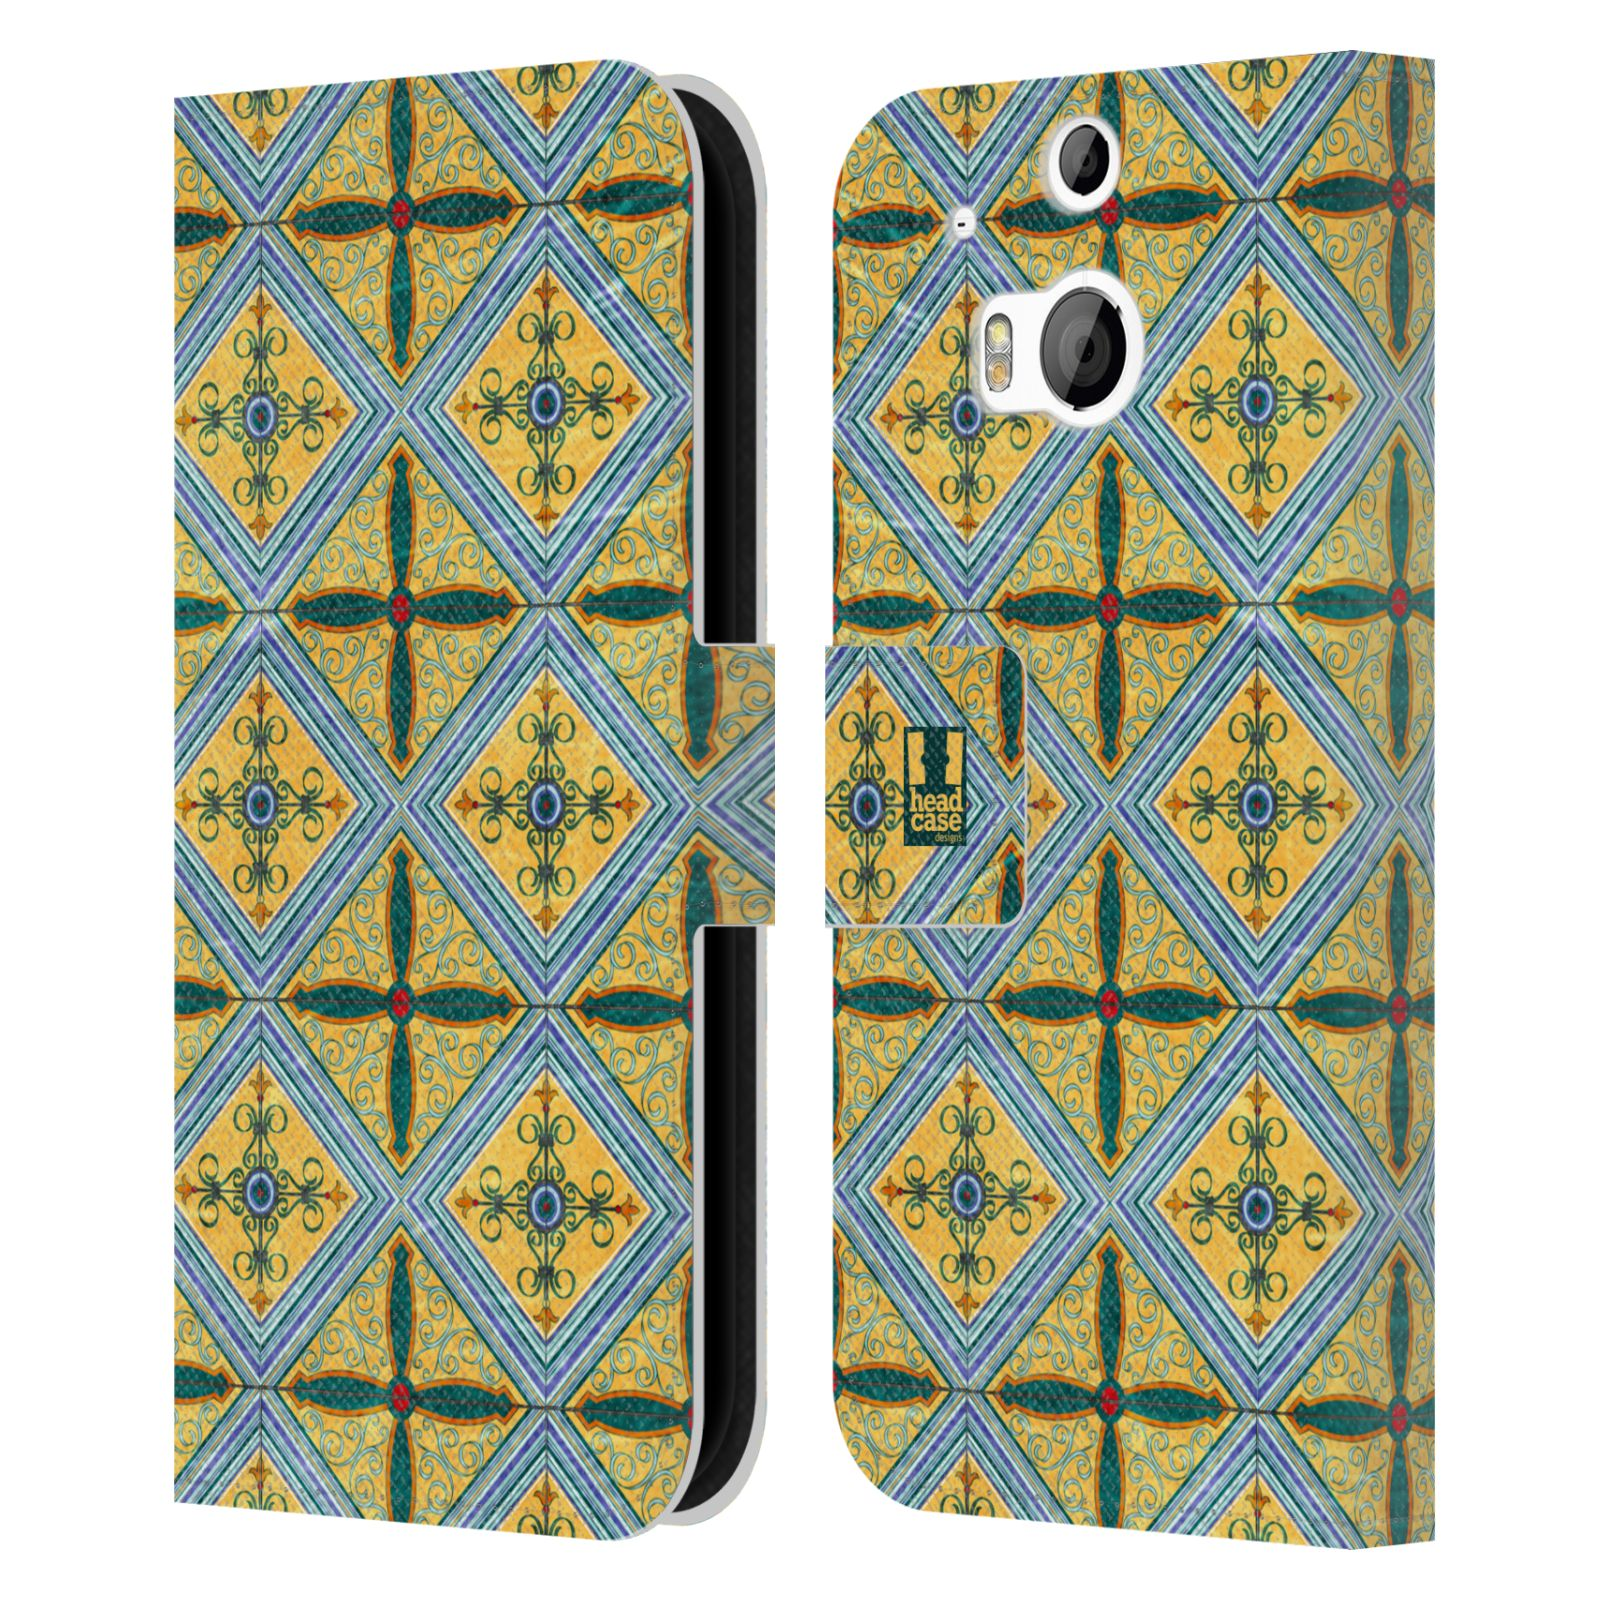 HEAD CASE Flipové pouzdro pro mobil HTC ONE (M8, M8s) ARABESKA CERAMIC žlutá